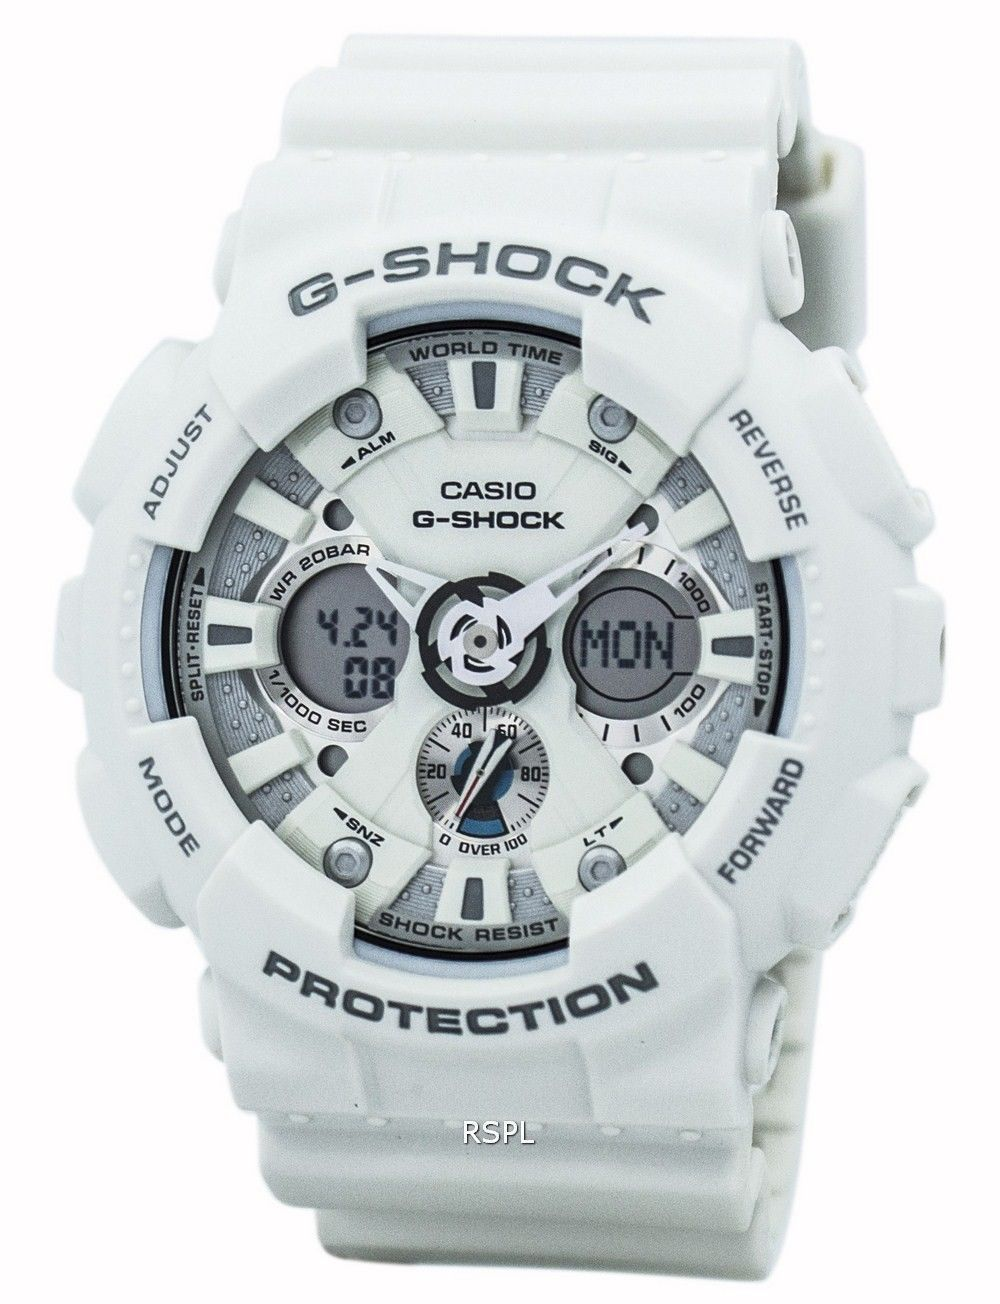 Casio G Shock Ga 120trm 7a White Mens Watch Update Daftar Harga 201tr 7adr Jam Tangan Pria Resin 120a 7 Analog Digital